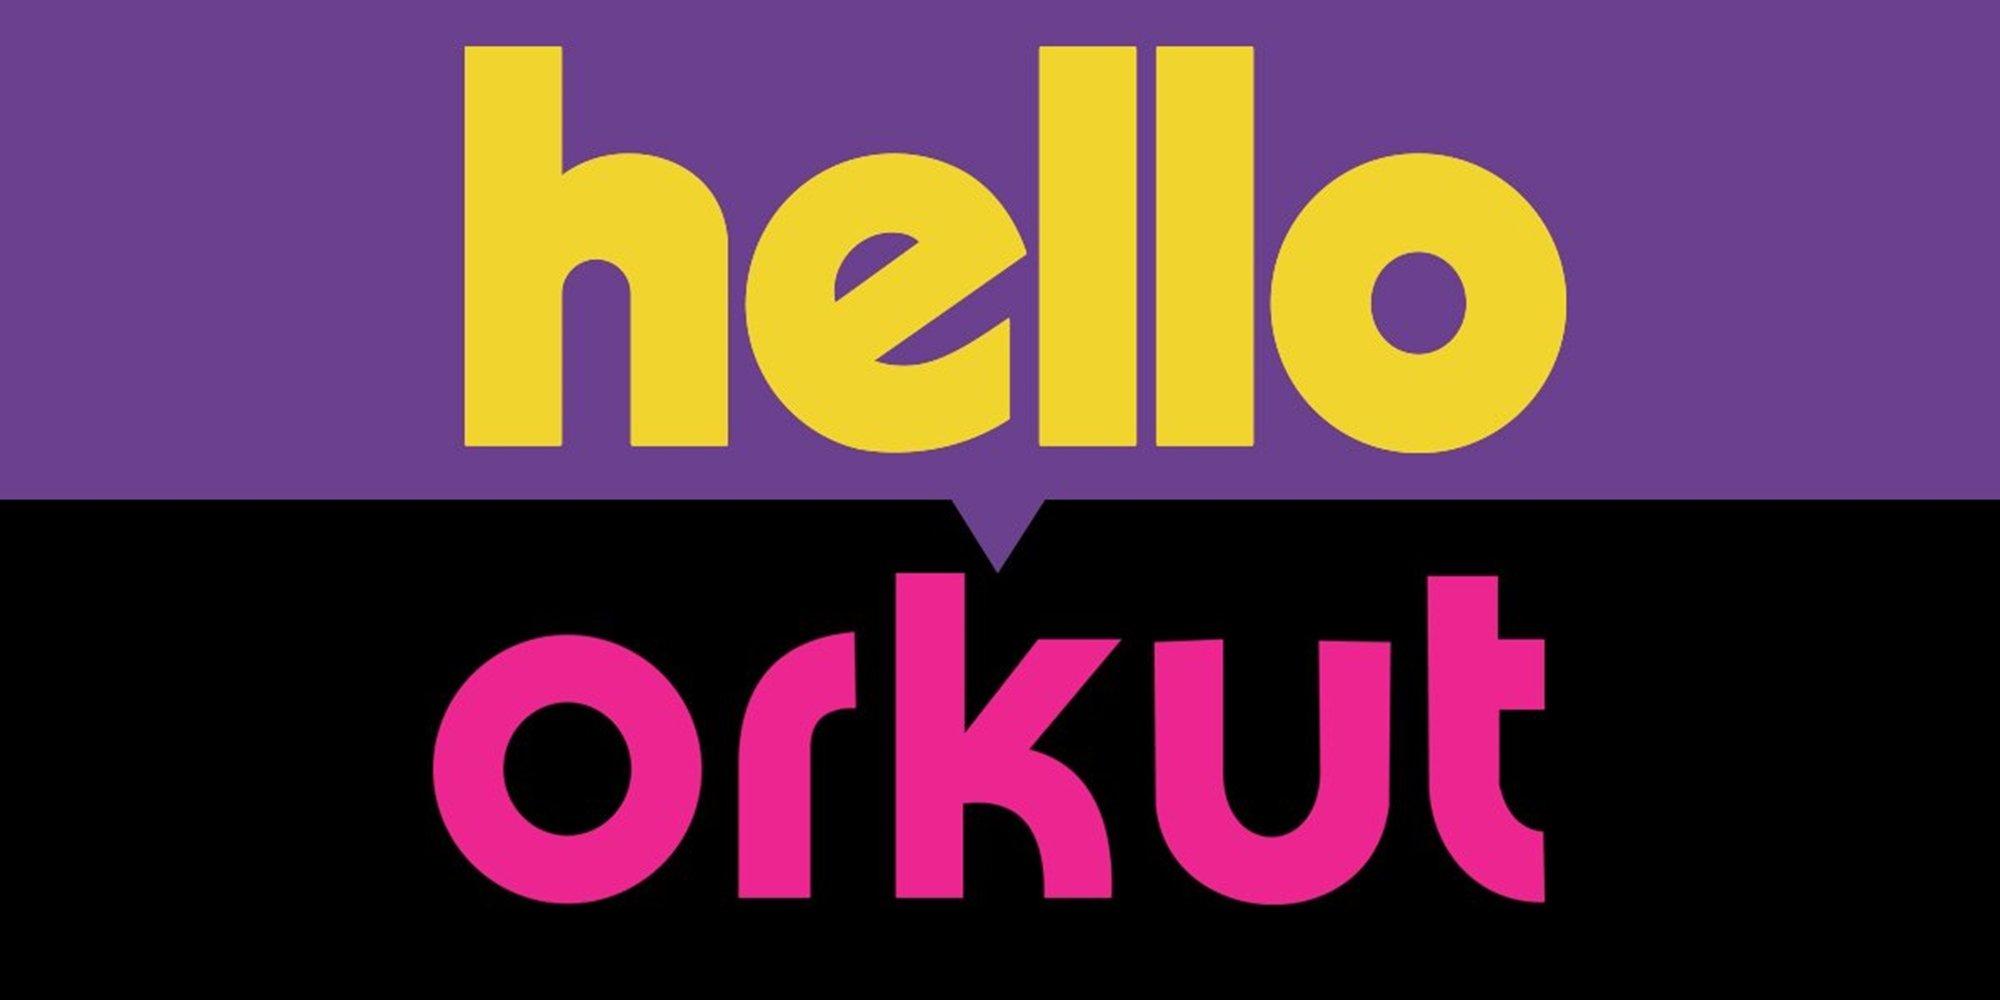 Baixar fotos do orkut 45